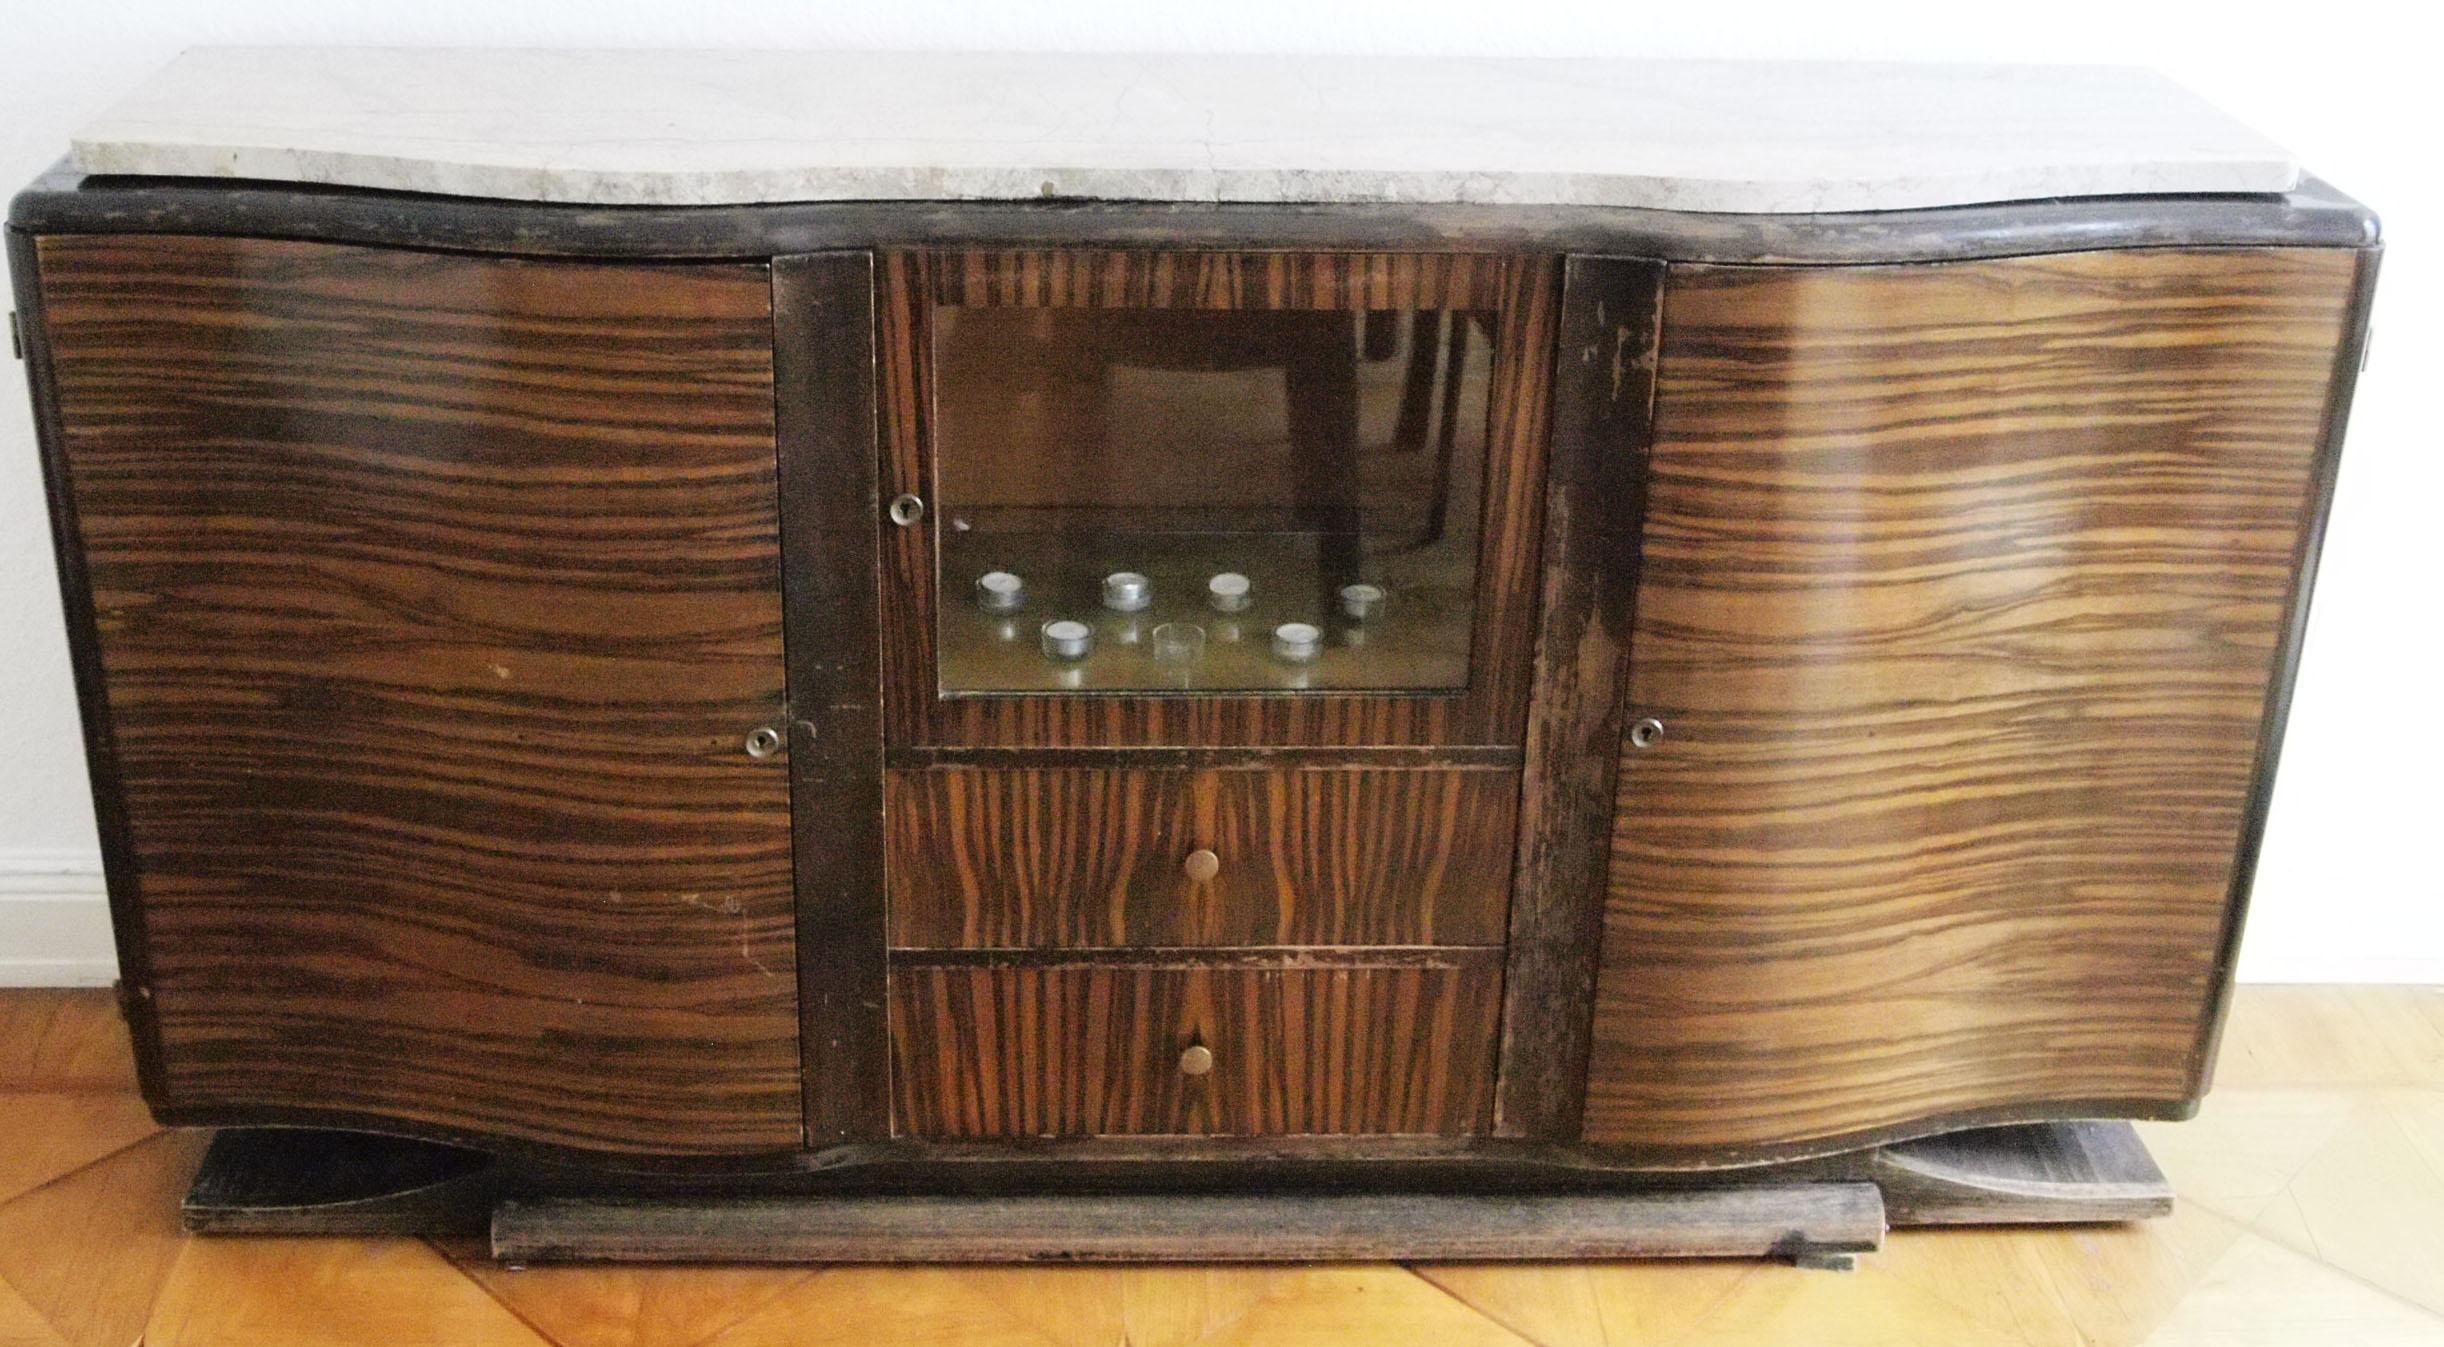 art deco sideboard anrichte makkassar furniert mit marmorplatte 1930er j ebay. Black Bedroom Furniture Sets. Home Design Ideas